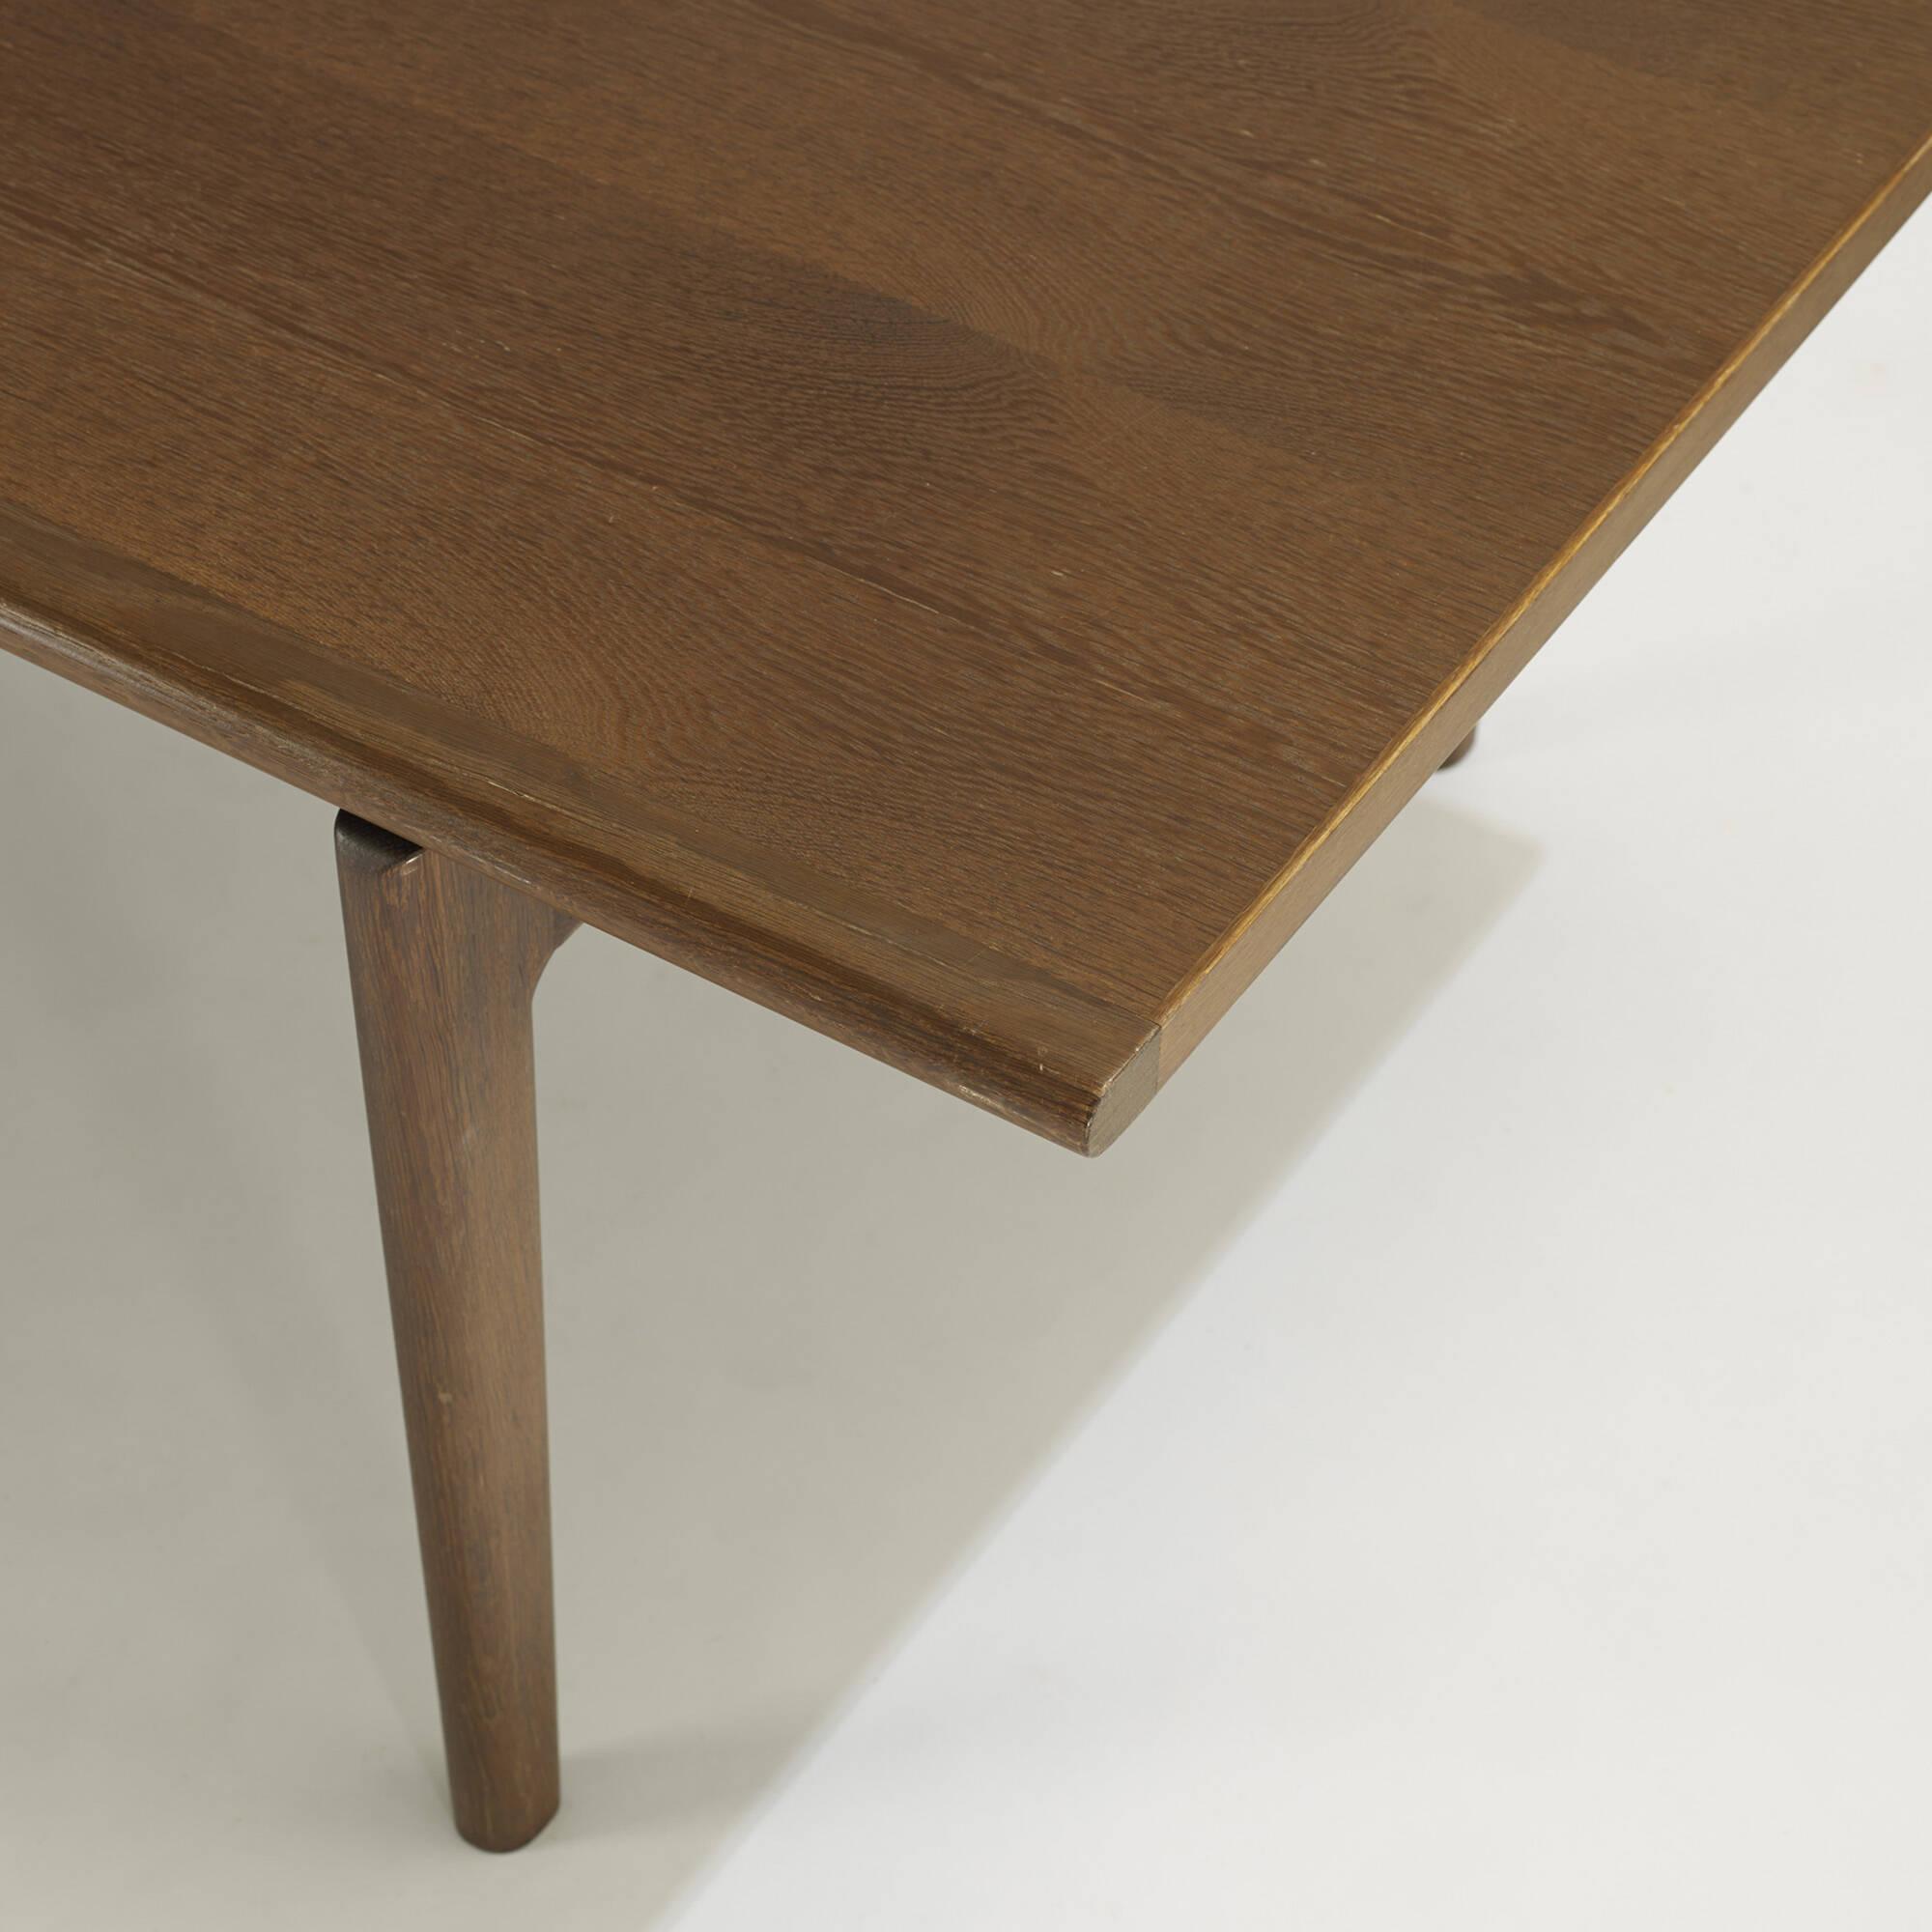 4x4 Coffee Table Rascalartsnyc